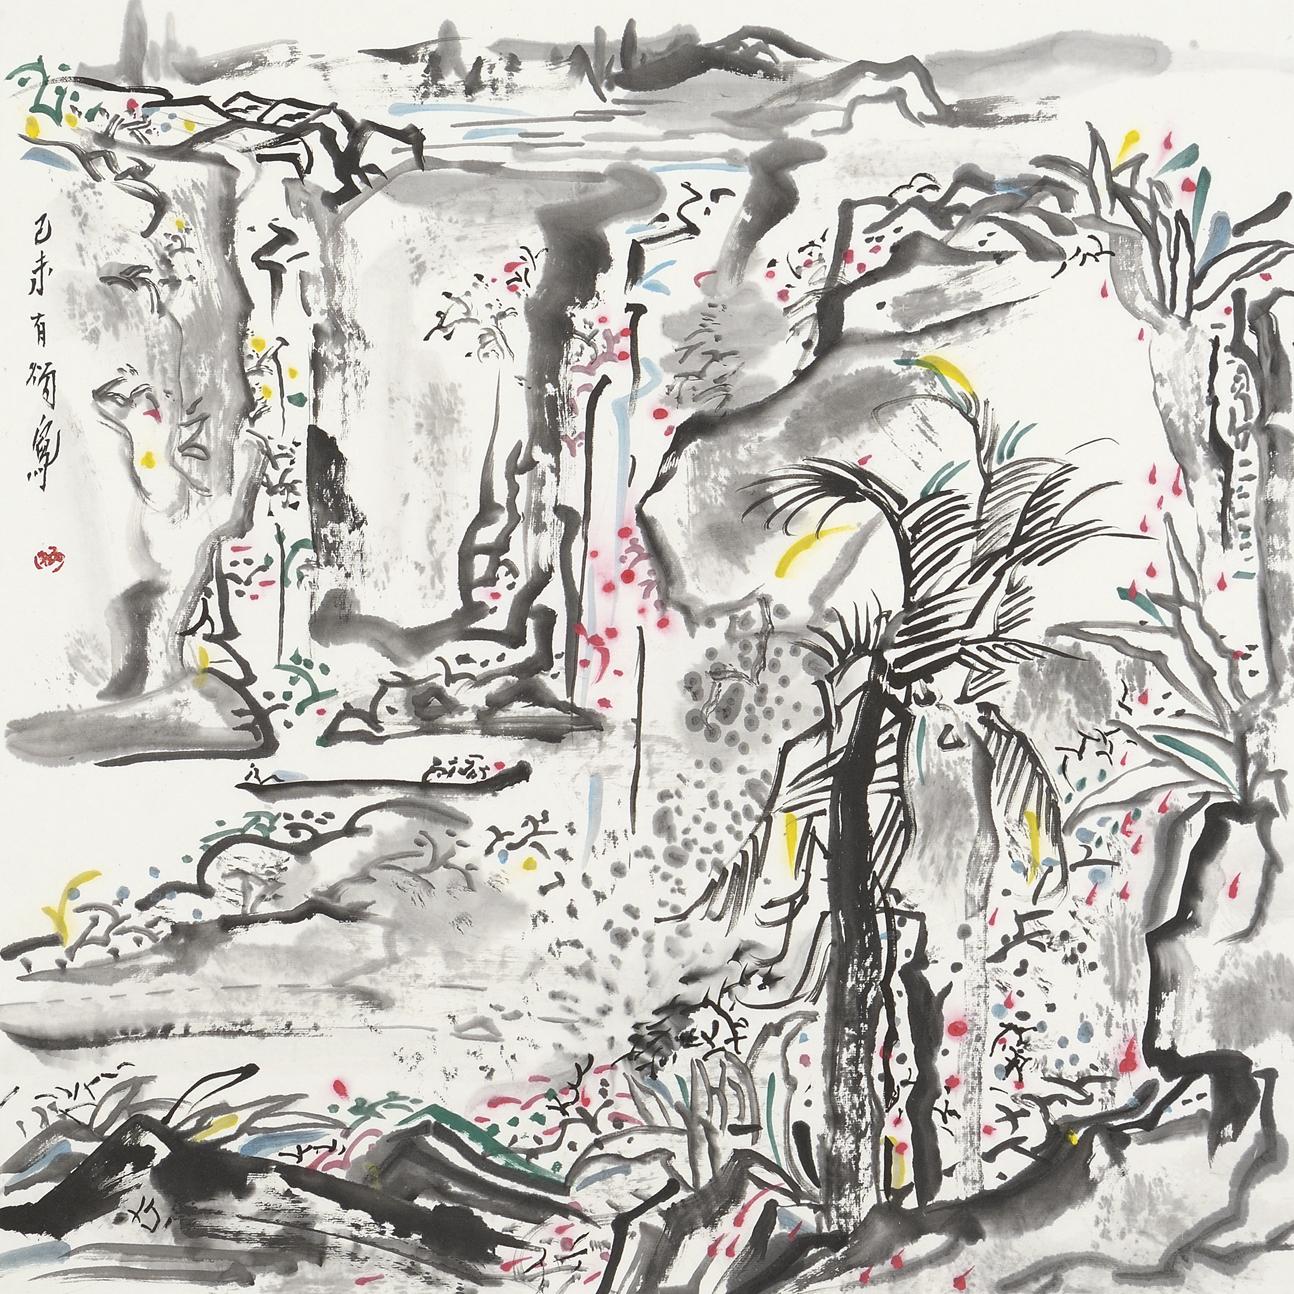 南洋山水 Nanyang Landscape (2015)